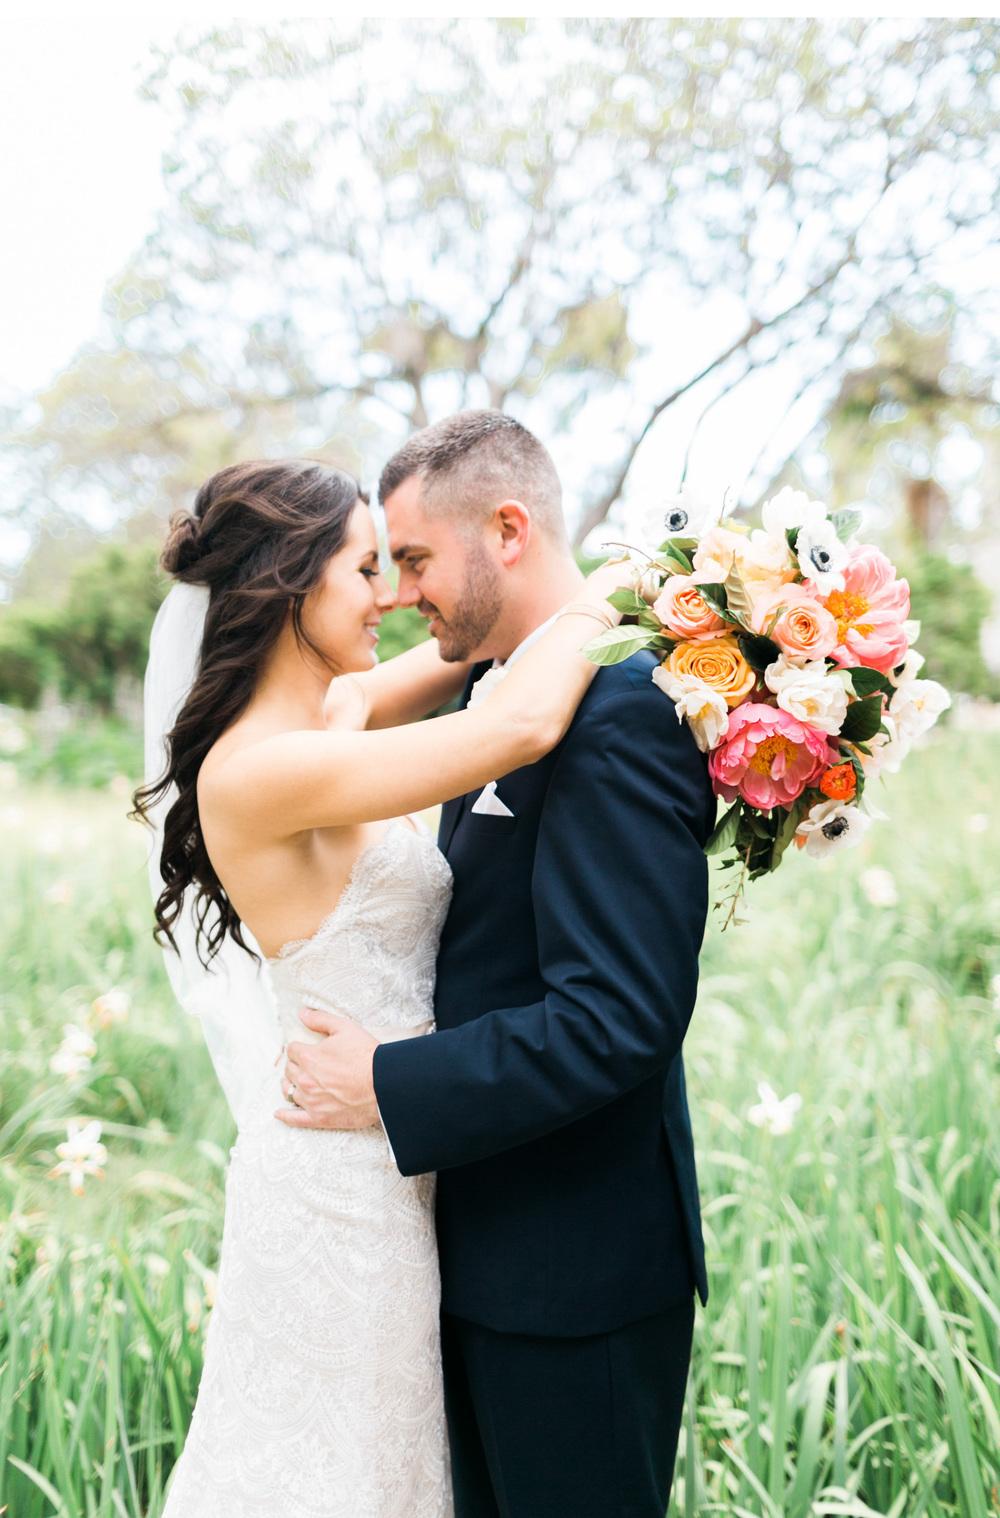 Adventure-Wedding-Photographer-Natalie-Schutt-Photography_02.jpg